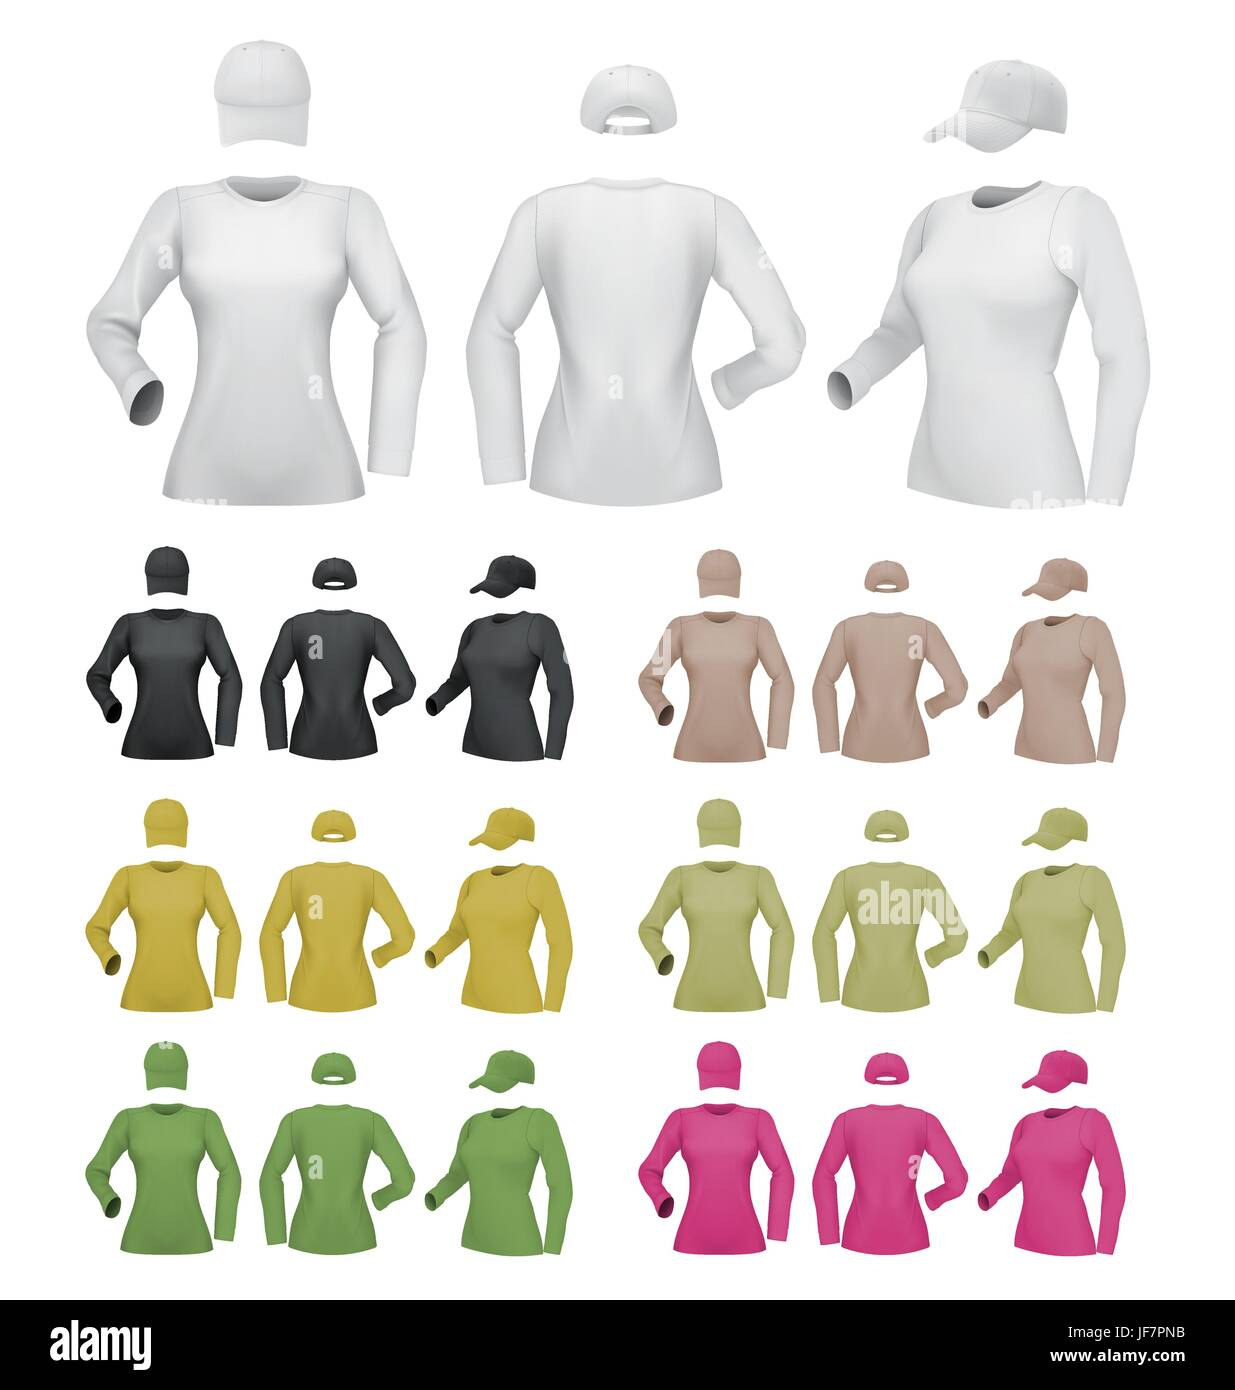 Plain Female Long Sleeve Shirt Template On White Background